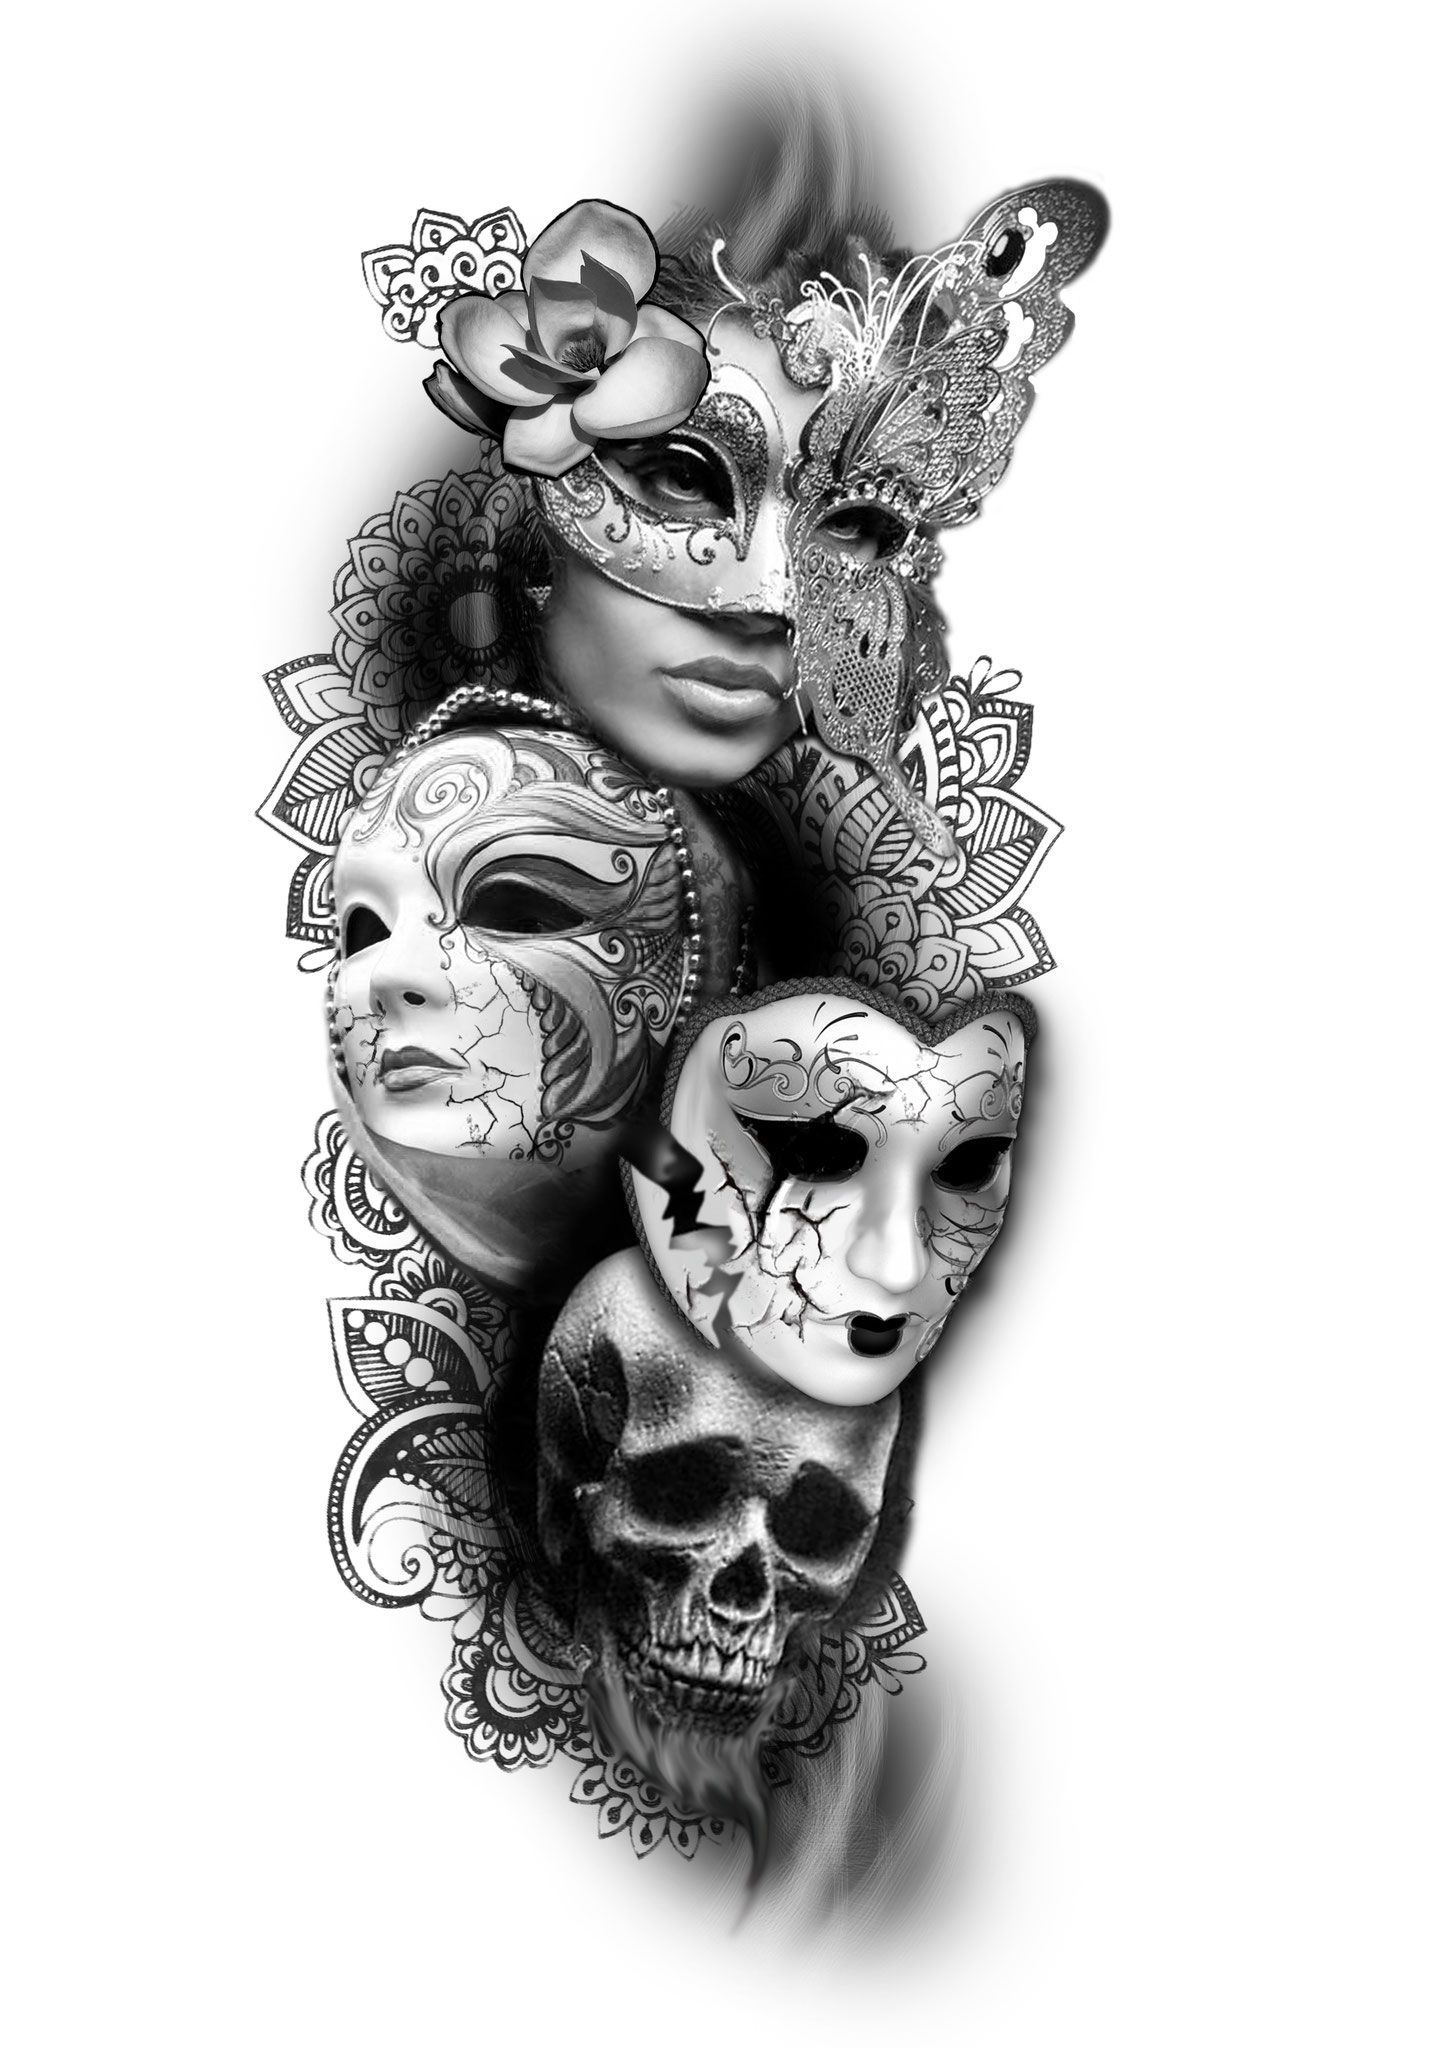 Happy and sad face masks happy and sad face tattoos - Venetian Masks Tattoo Beauty To Decay